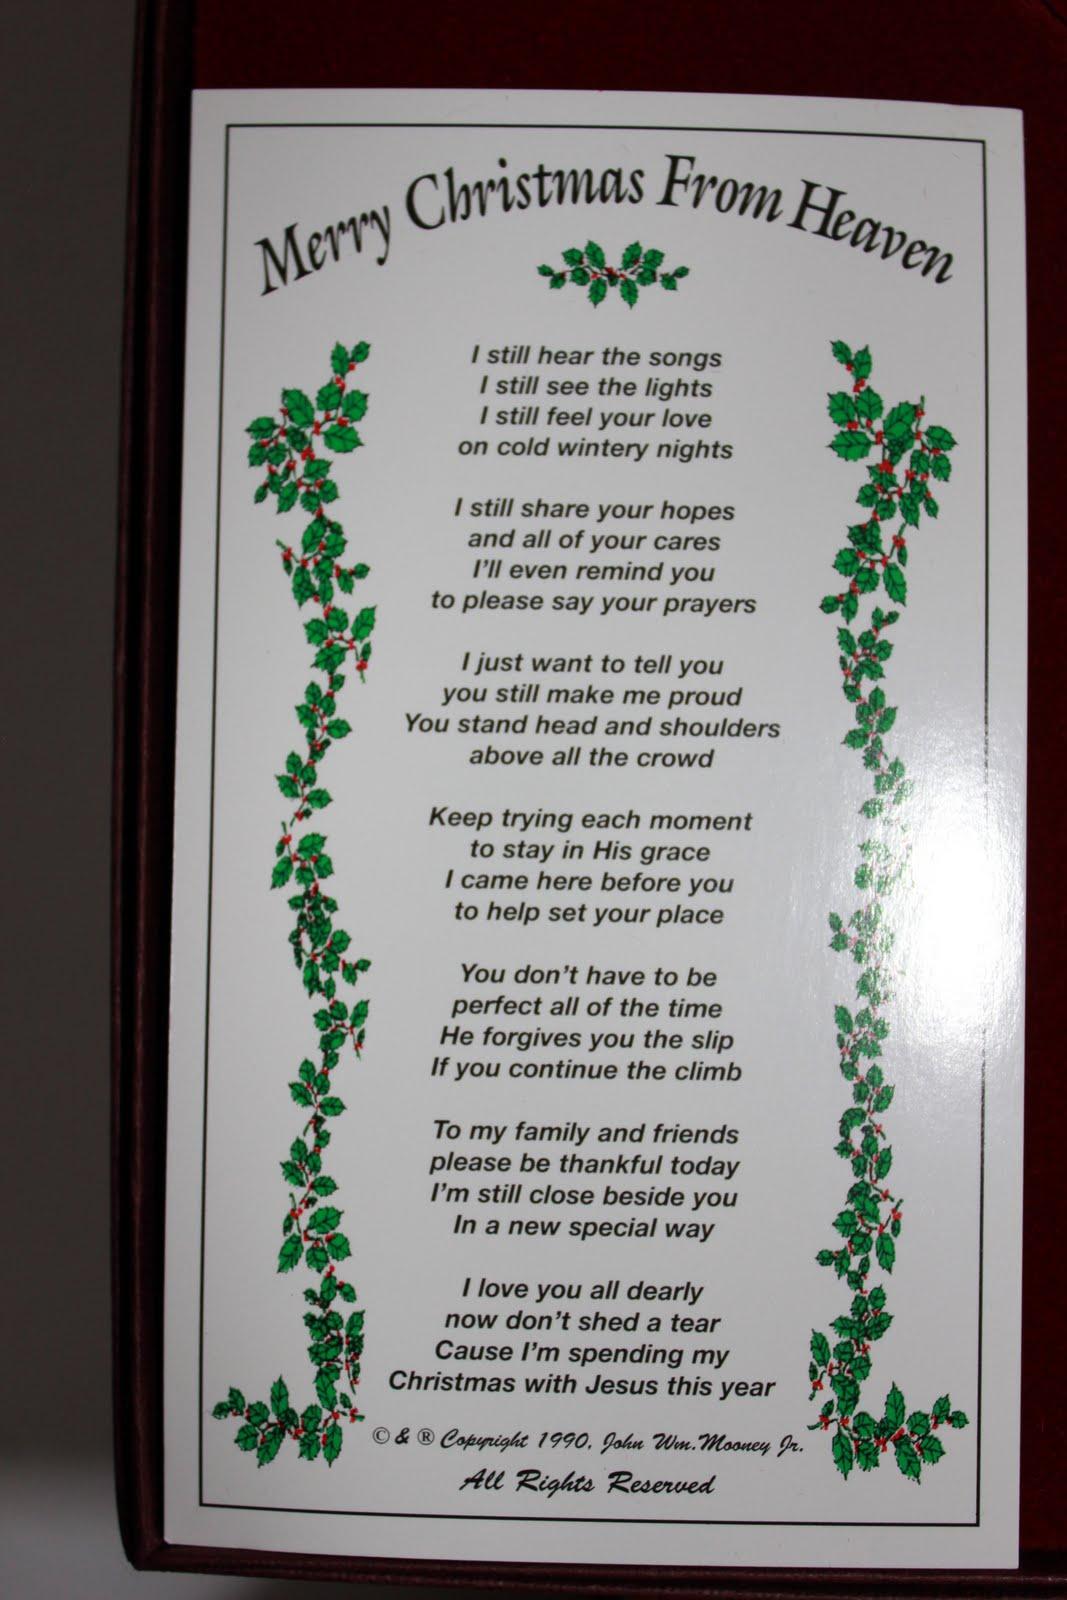 Christmas From Heaven.Living The Good Life In Grandmaville Merry Christmas From